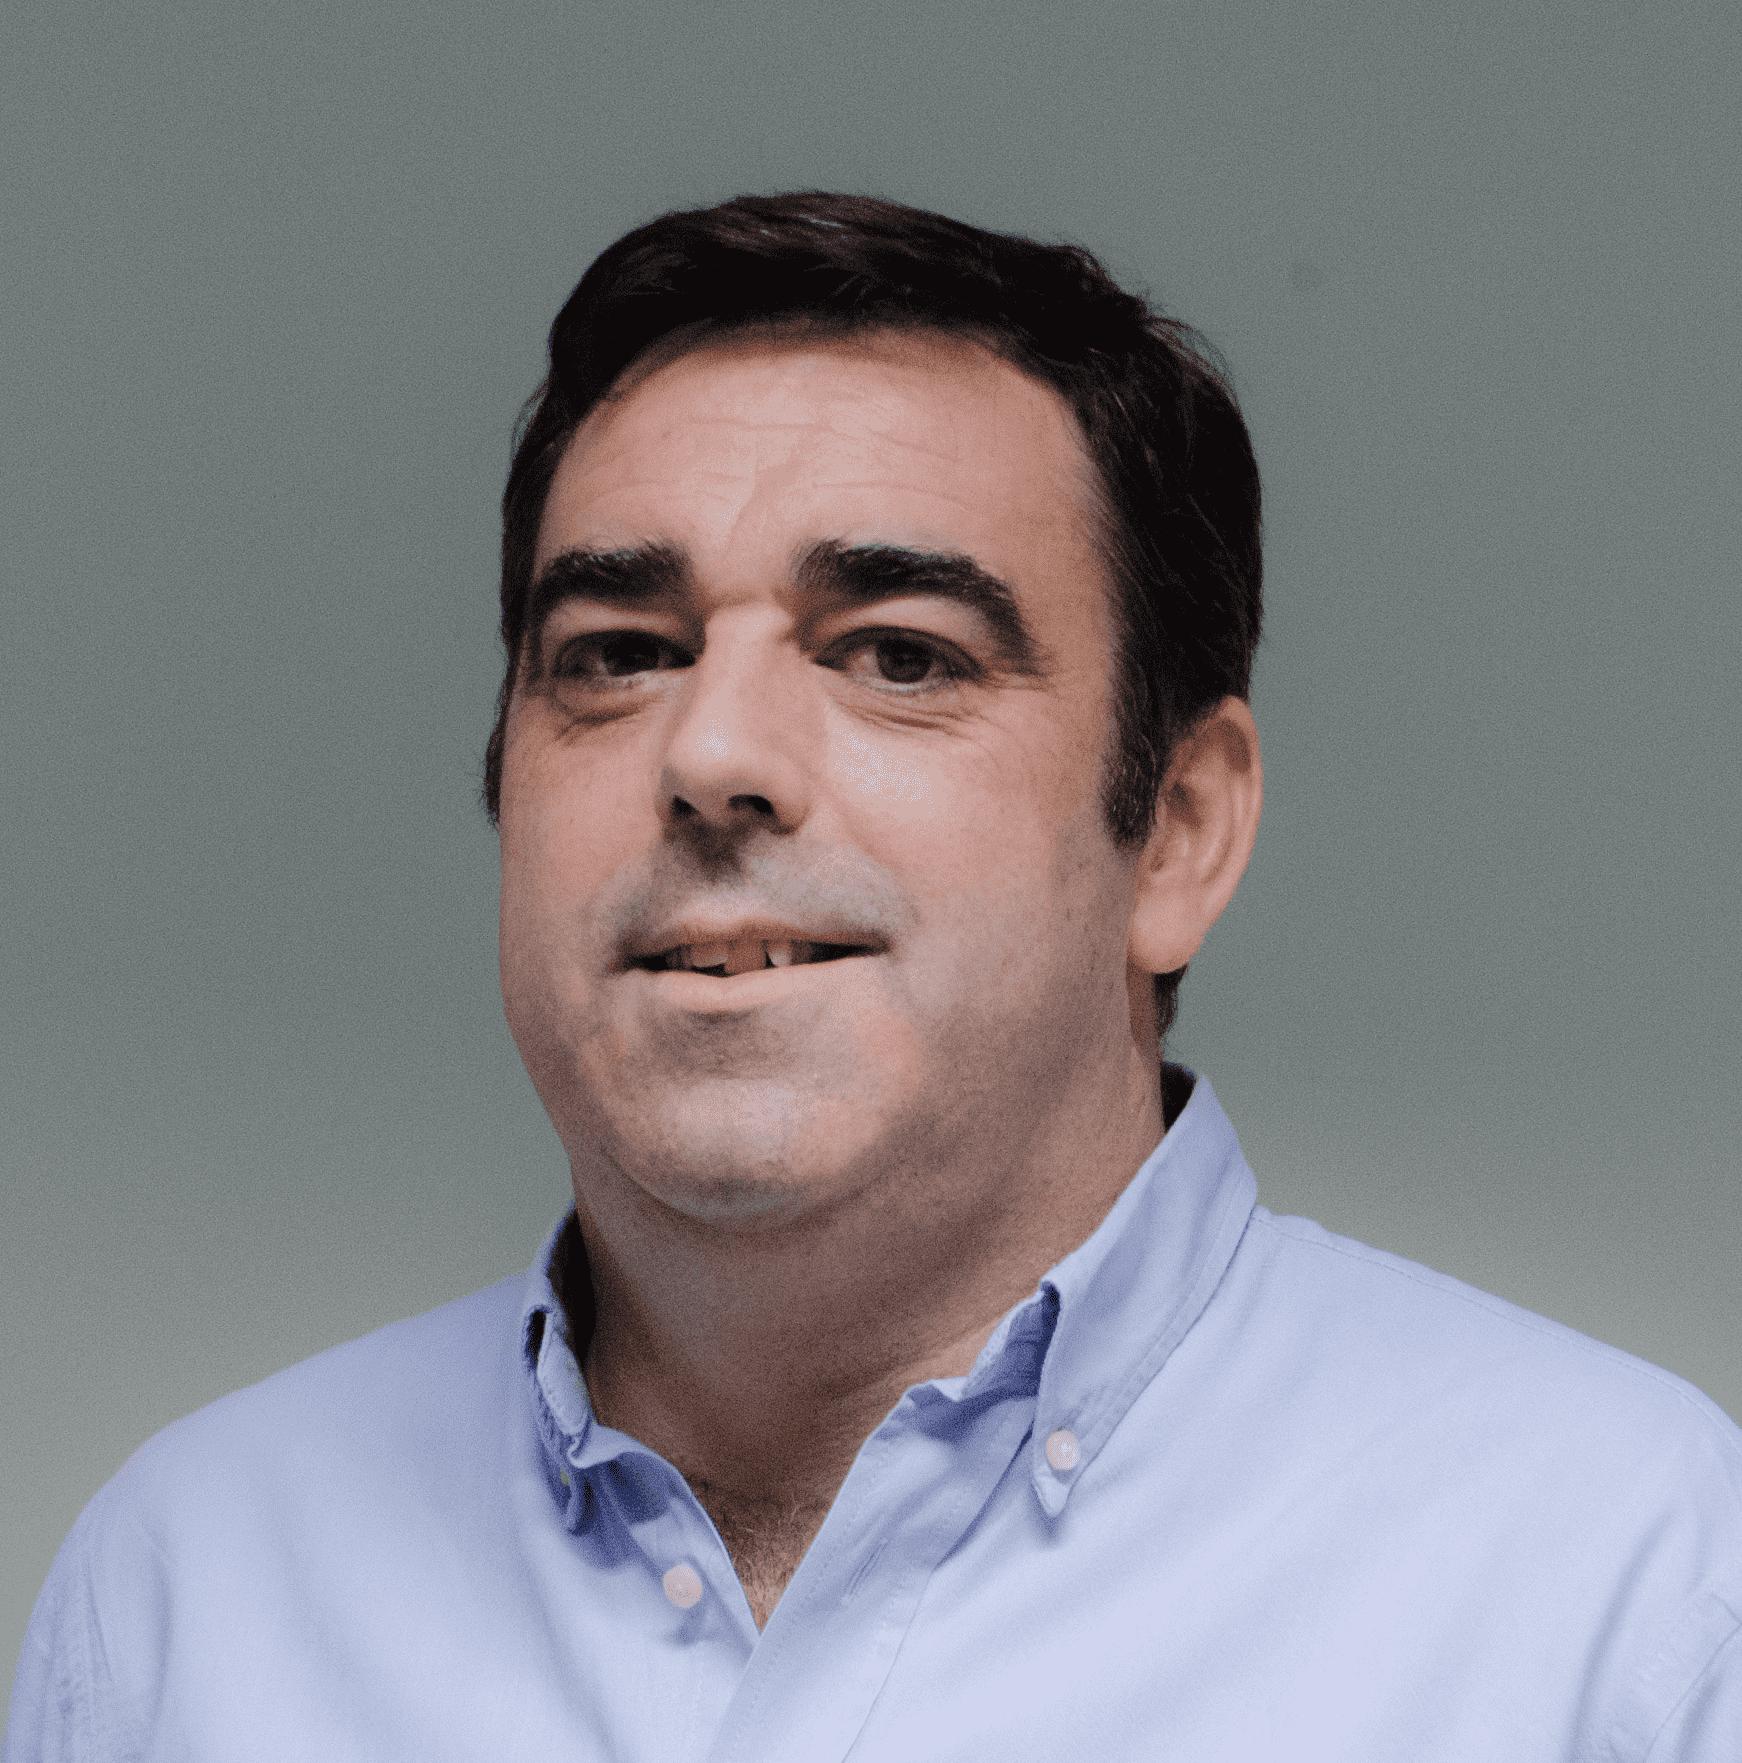 Jose Antonio Rodríguez Díaz